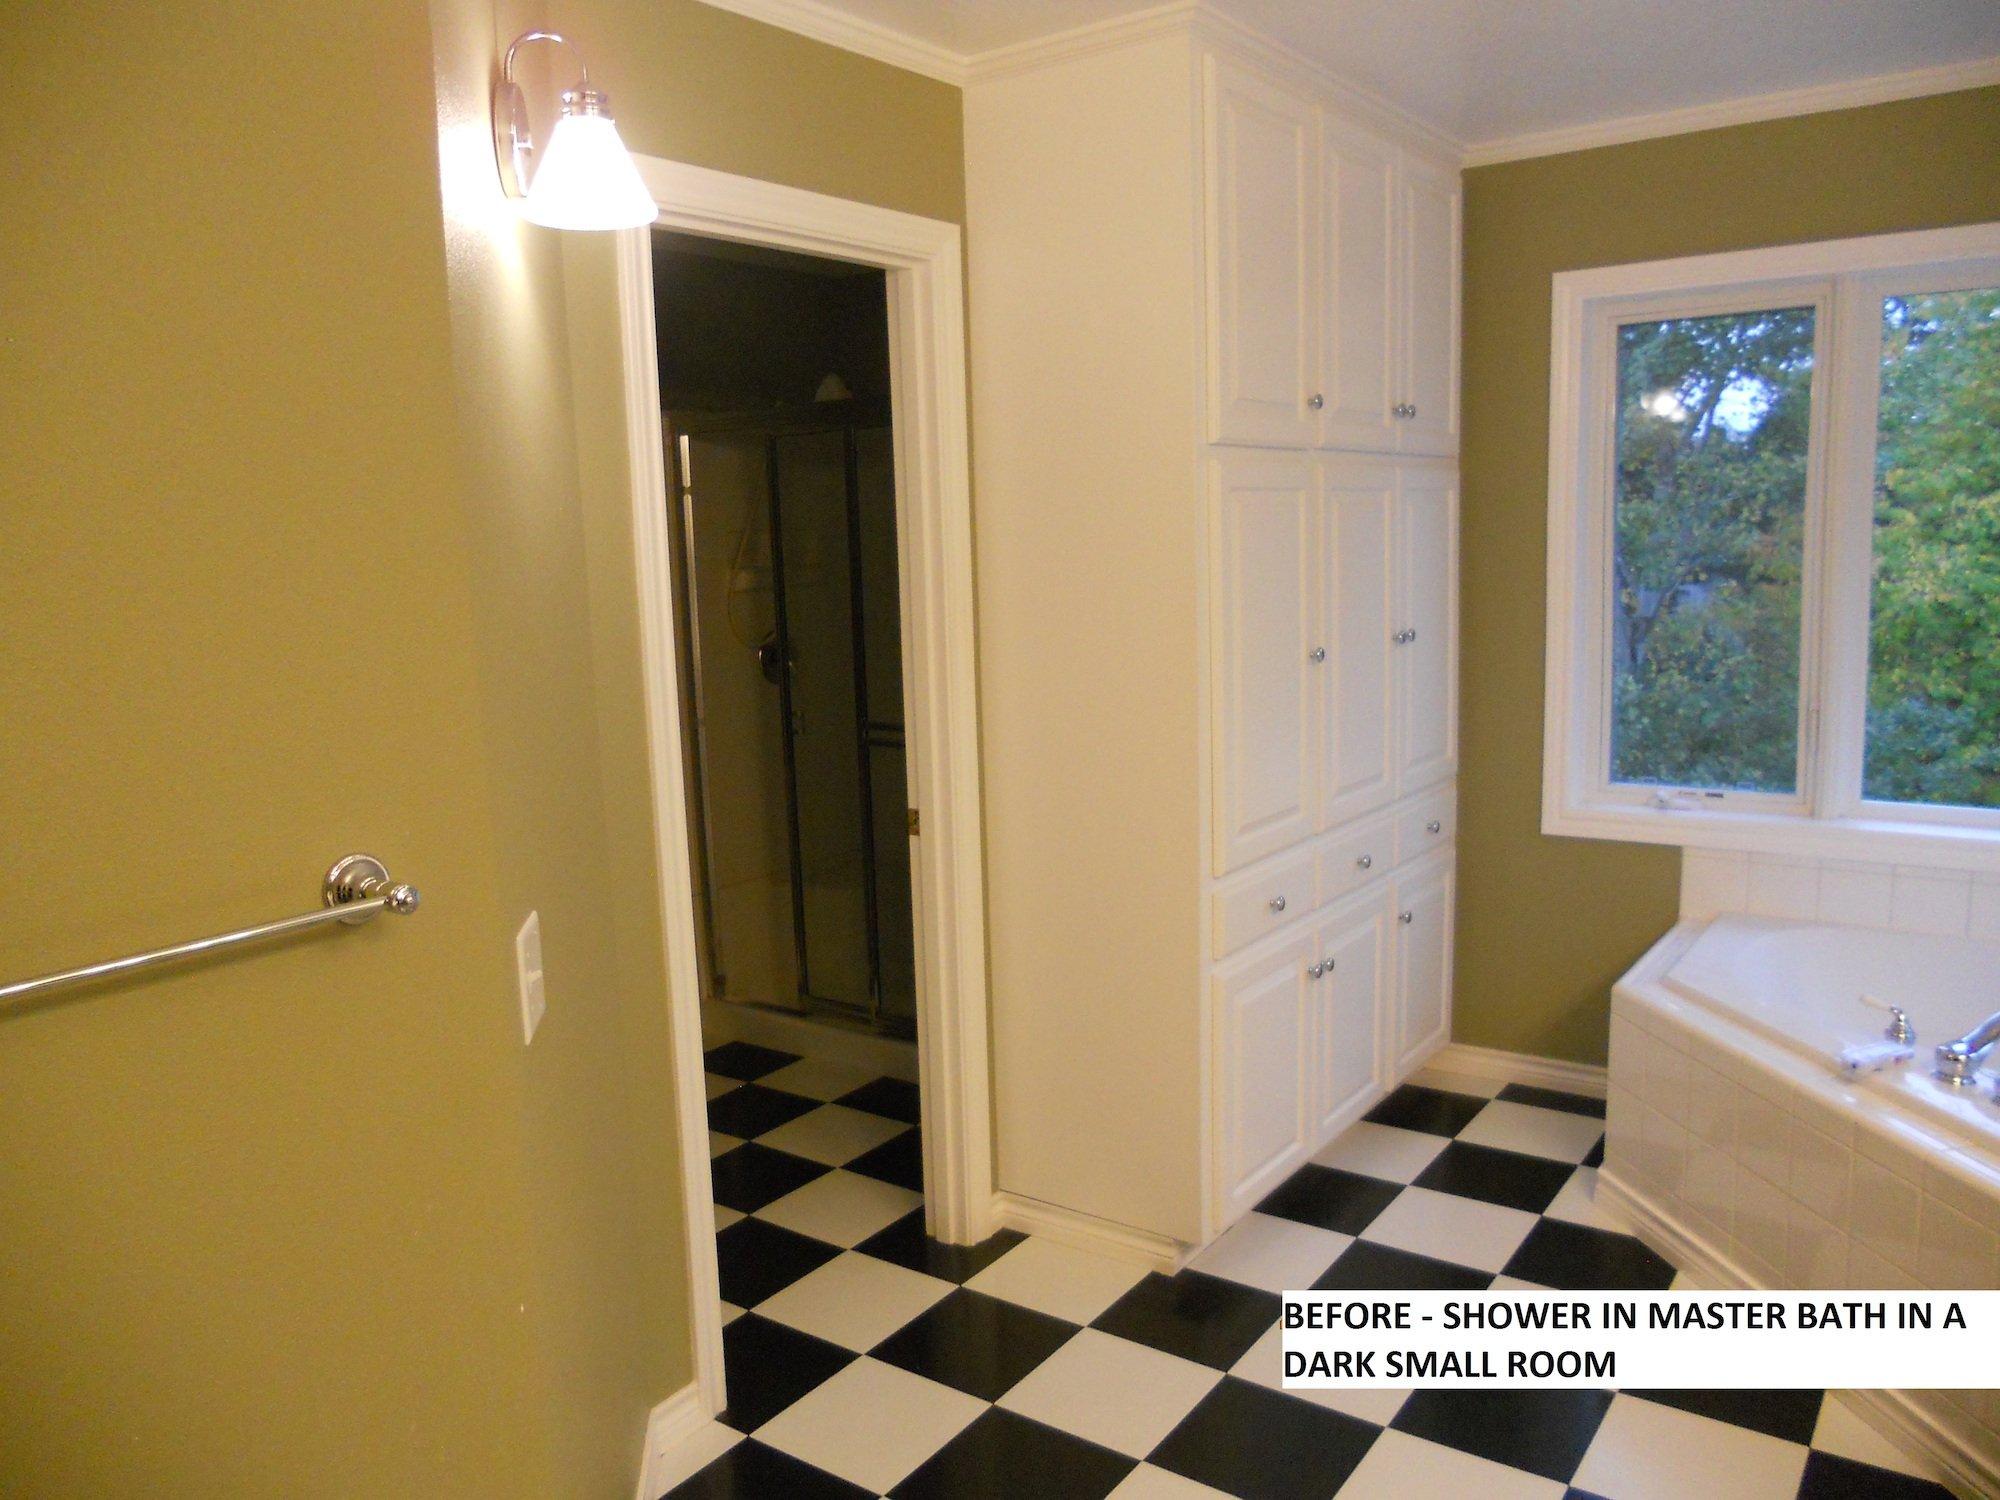 Hartung Farm Master Bathroom Remodel Before & After - L.Evans Design ...